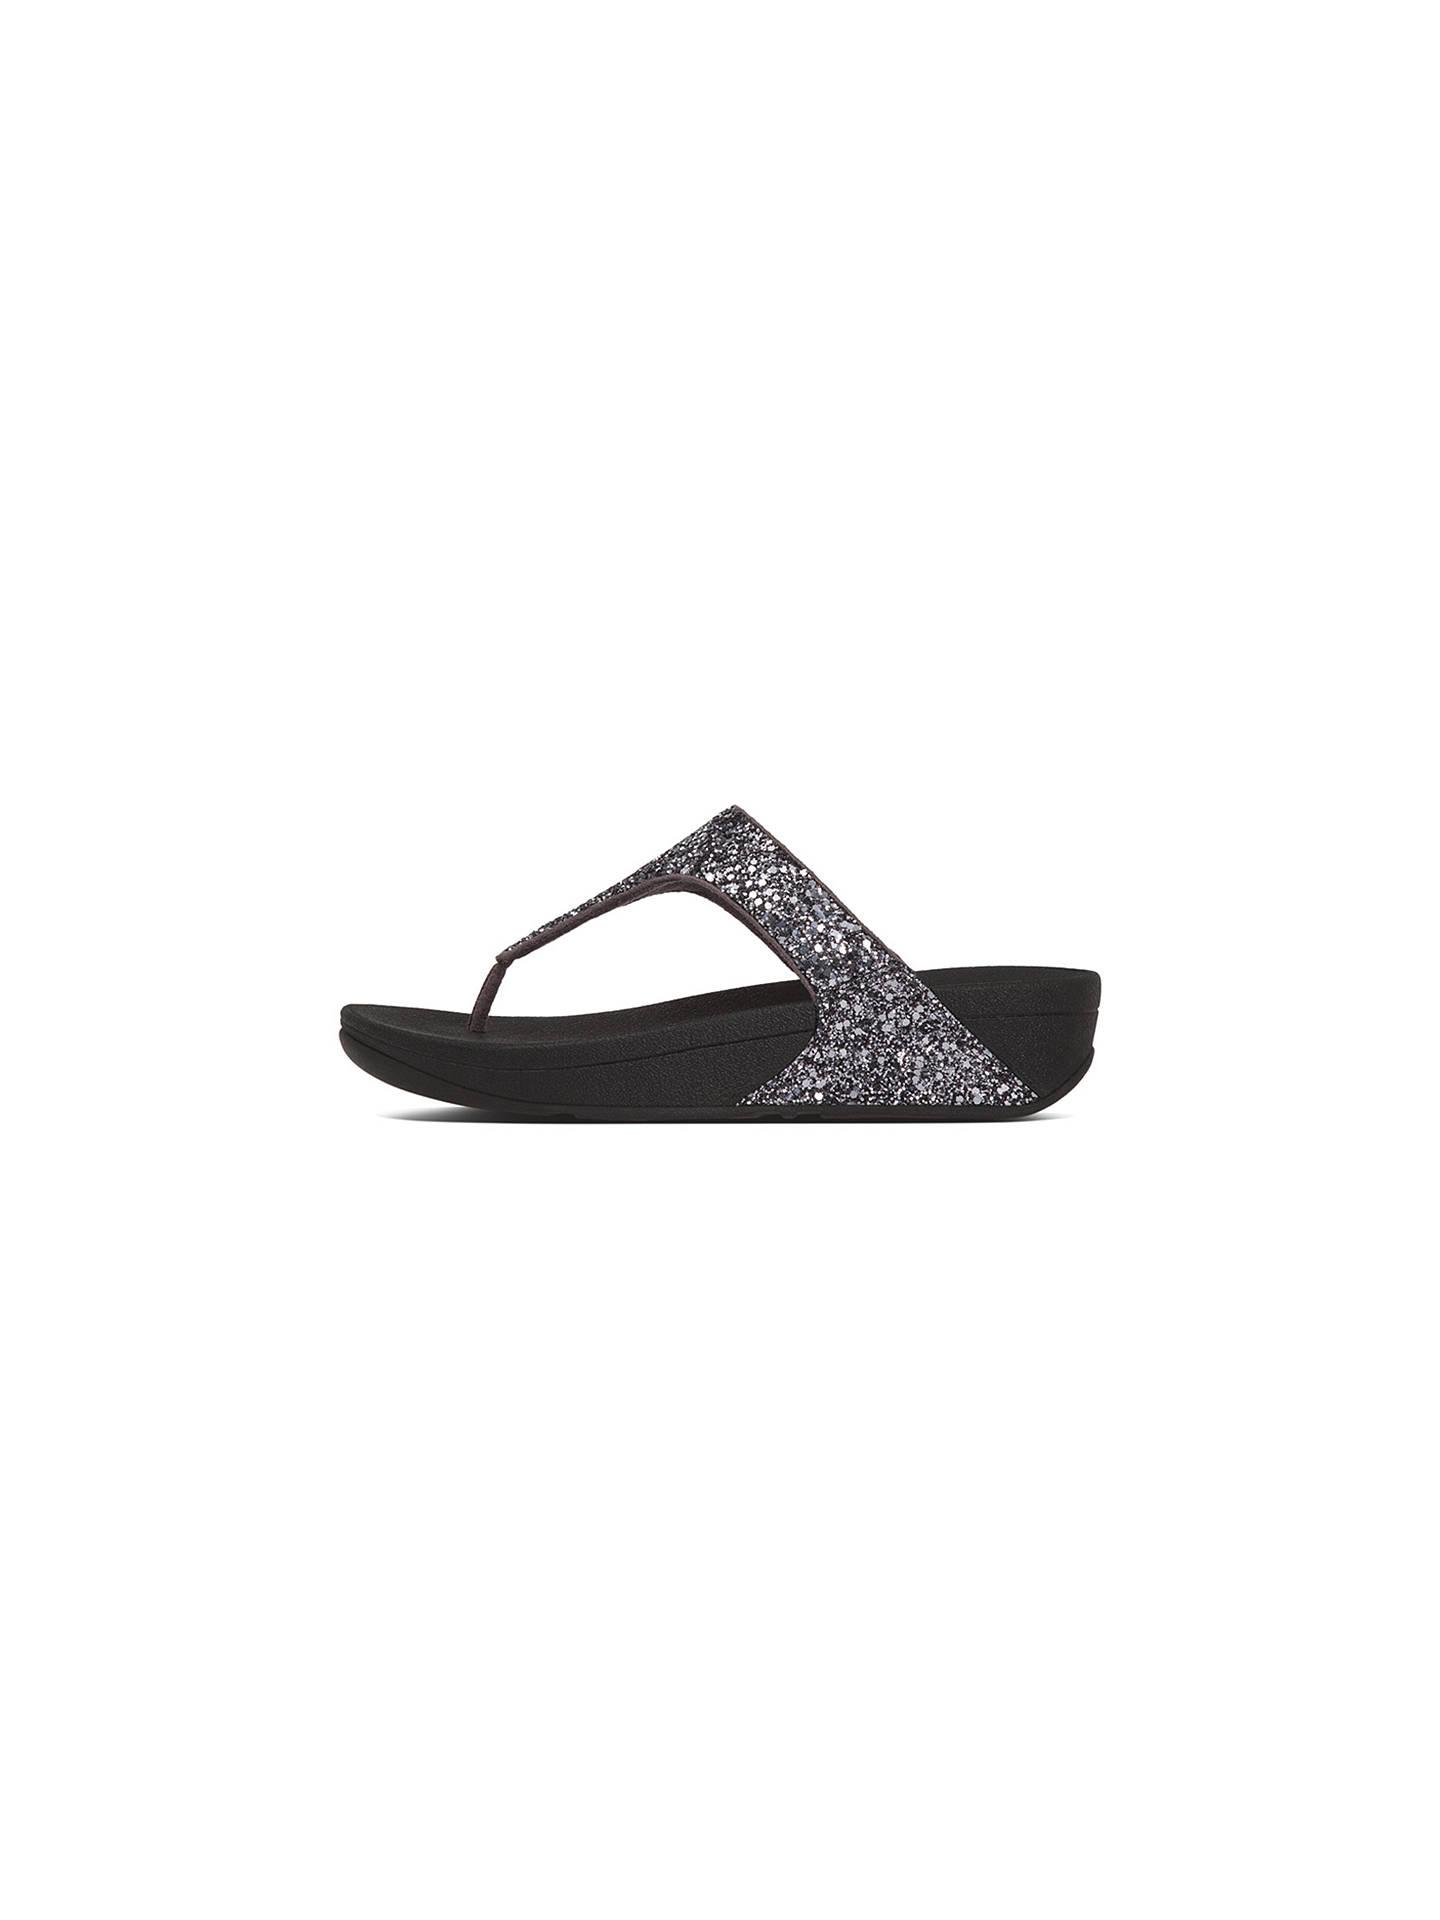 4847626badd7 FitFlop Glitterball Toe Post Flip Flops at John Lewis   Partners